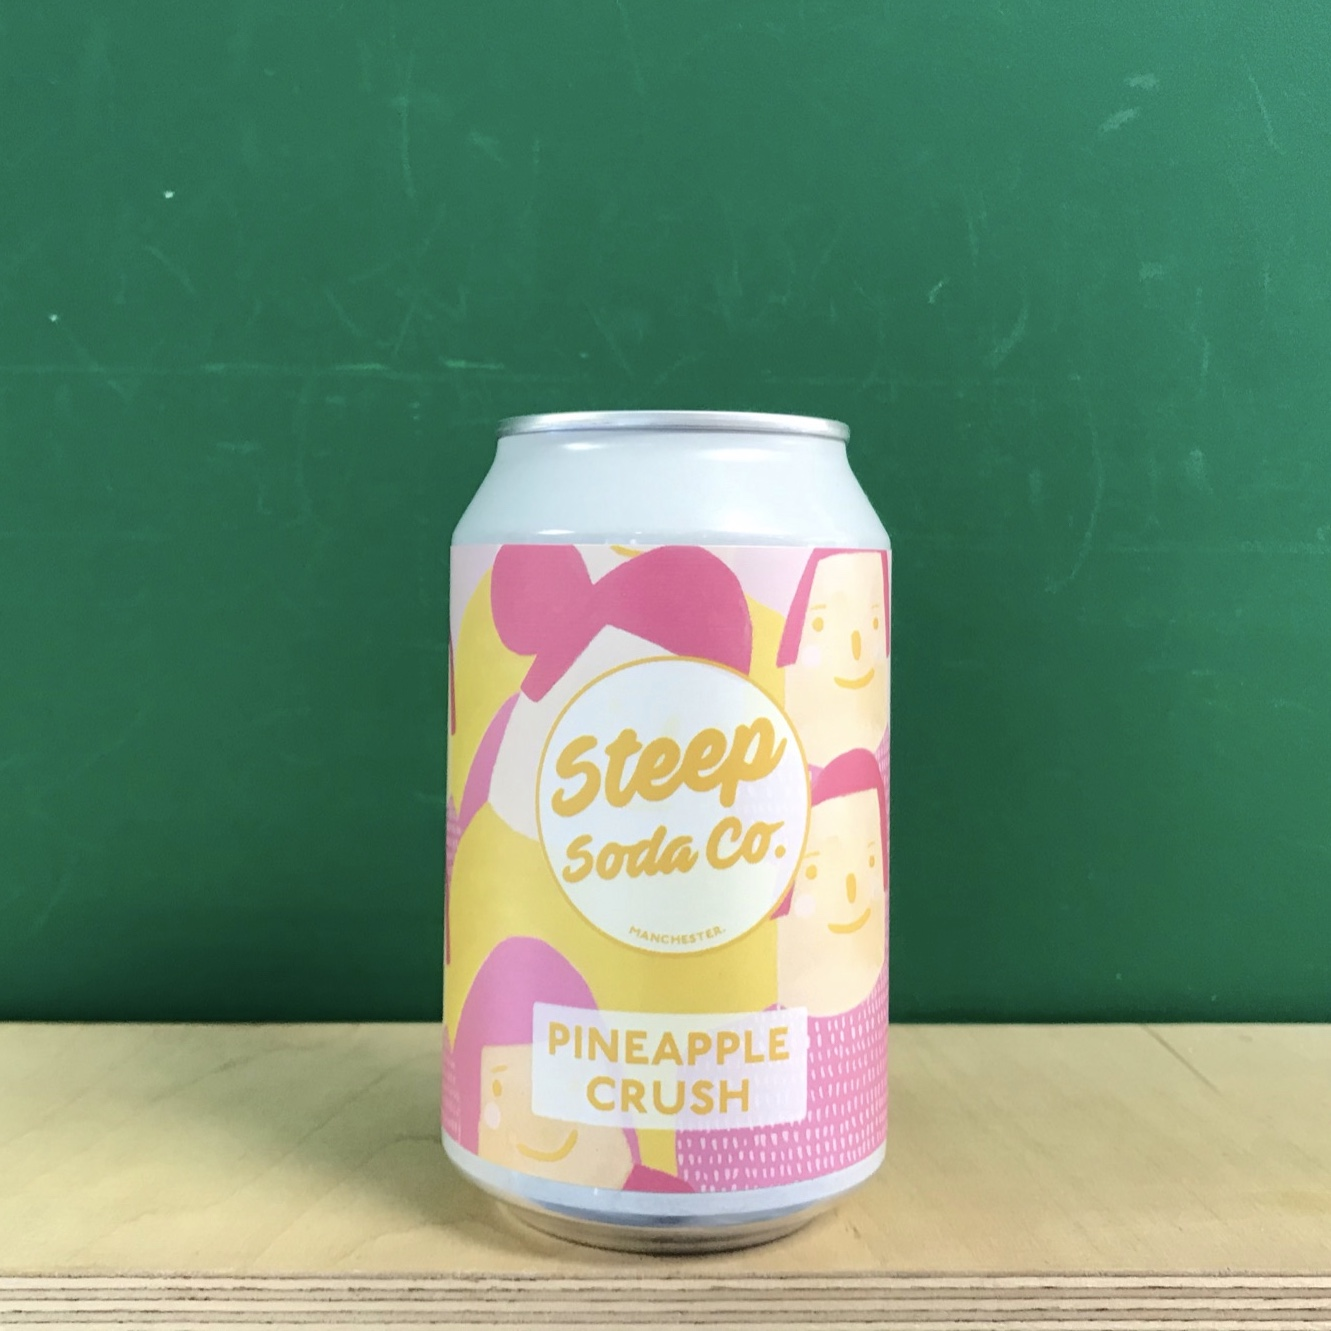 Steep Soda Co Pineapple Crush